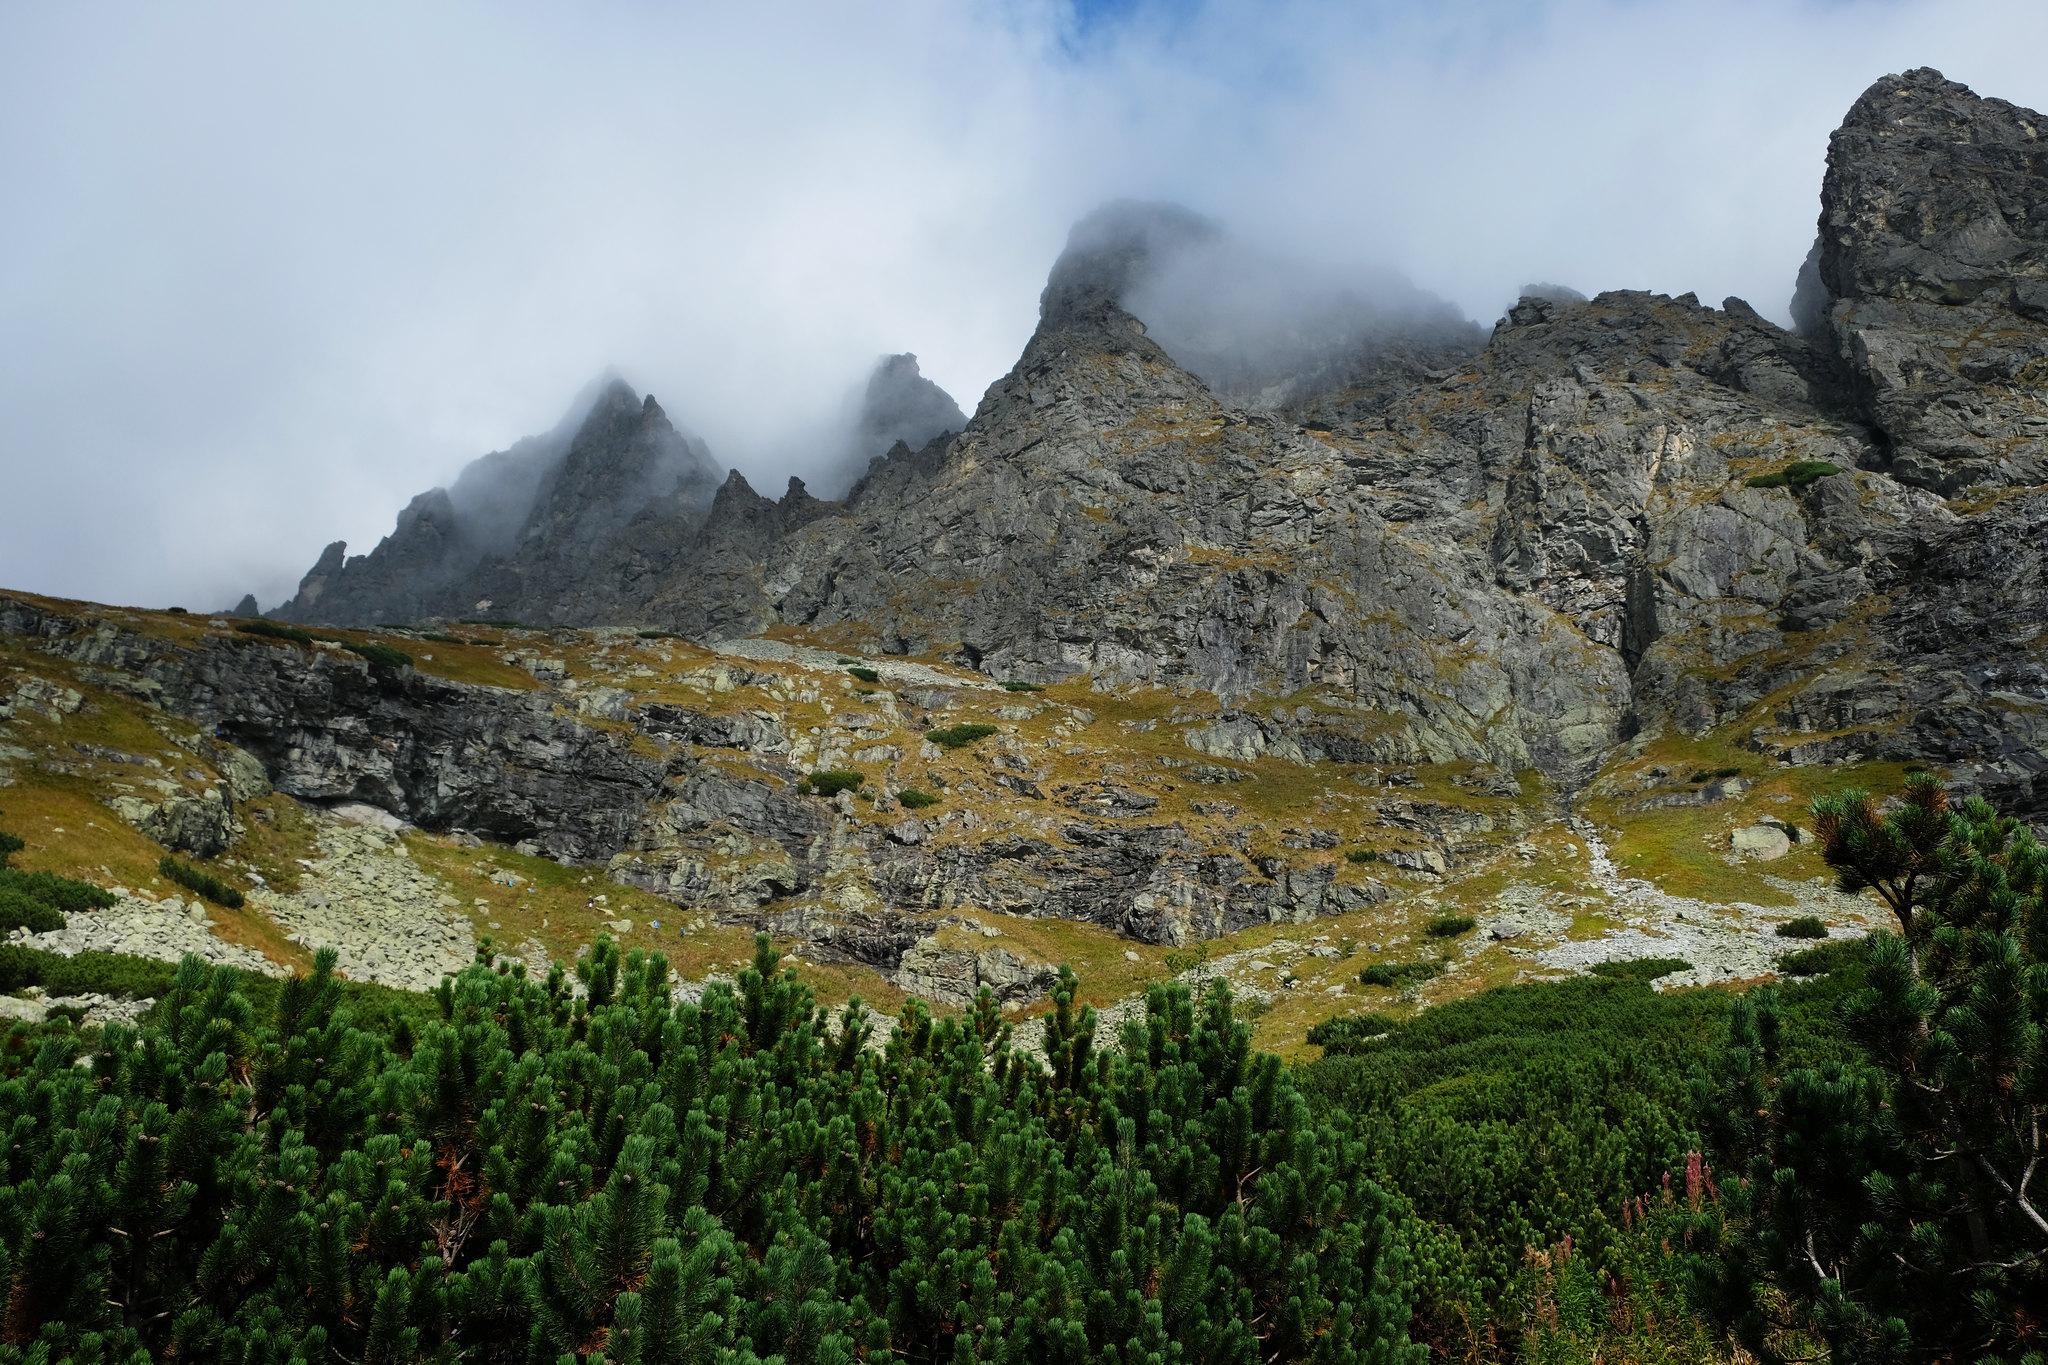 Foggy High Tatras, Slovakia